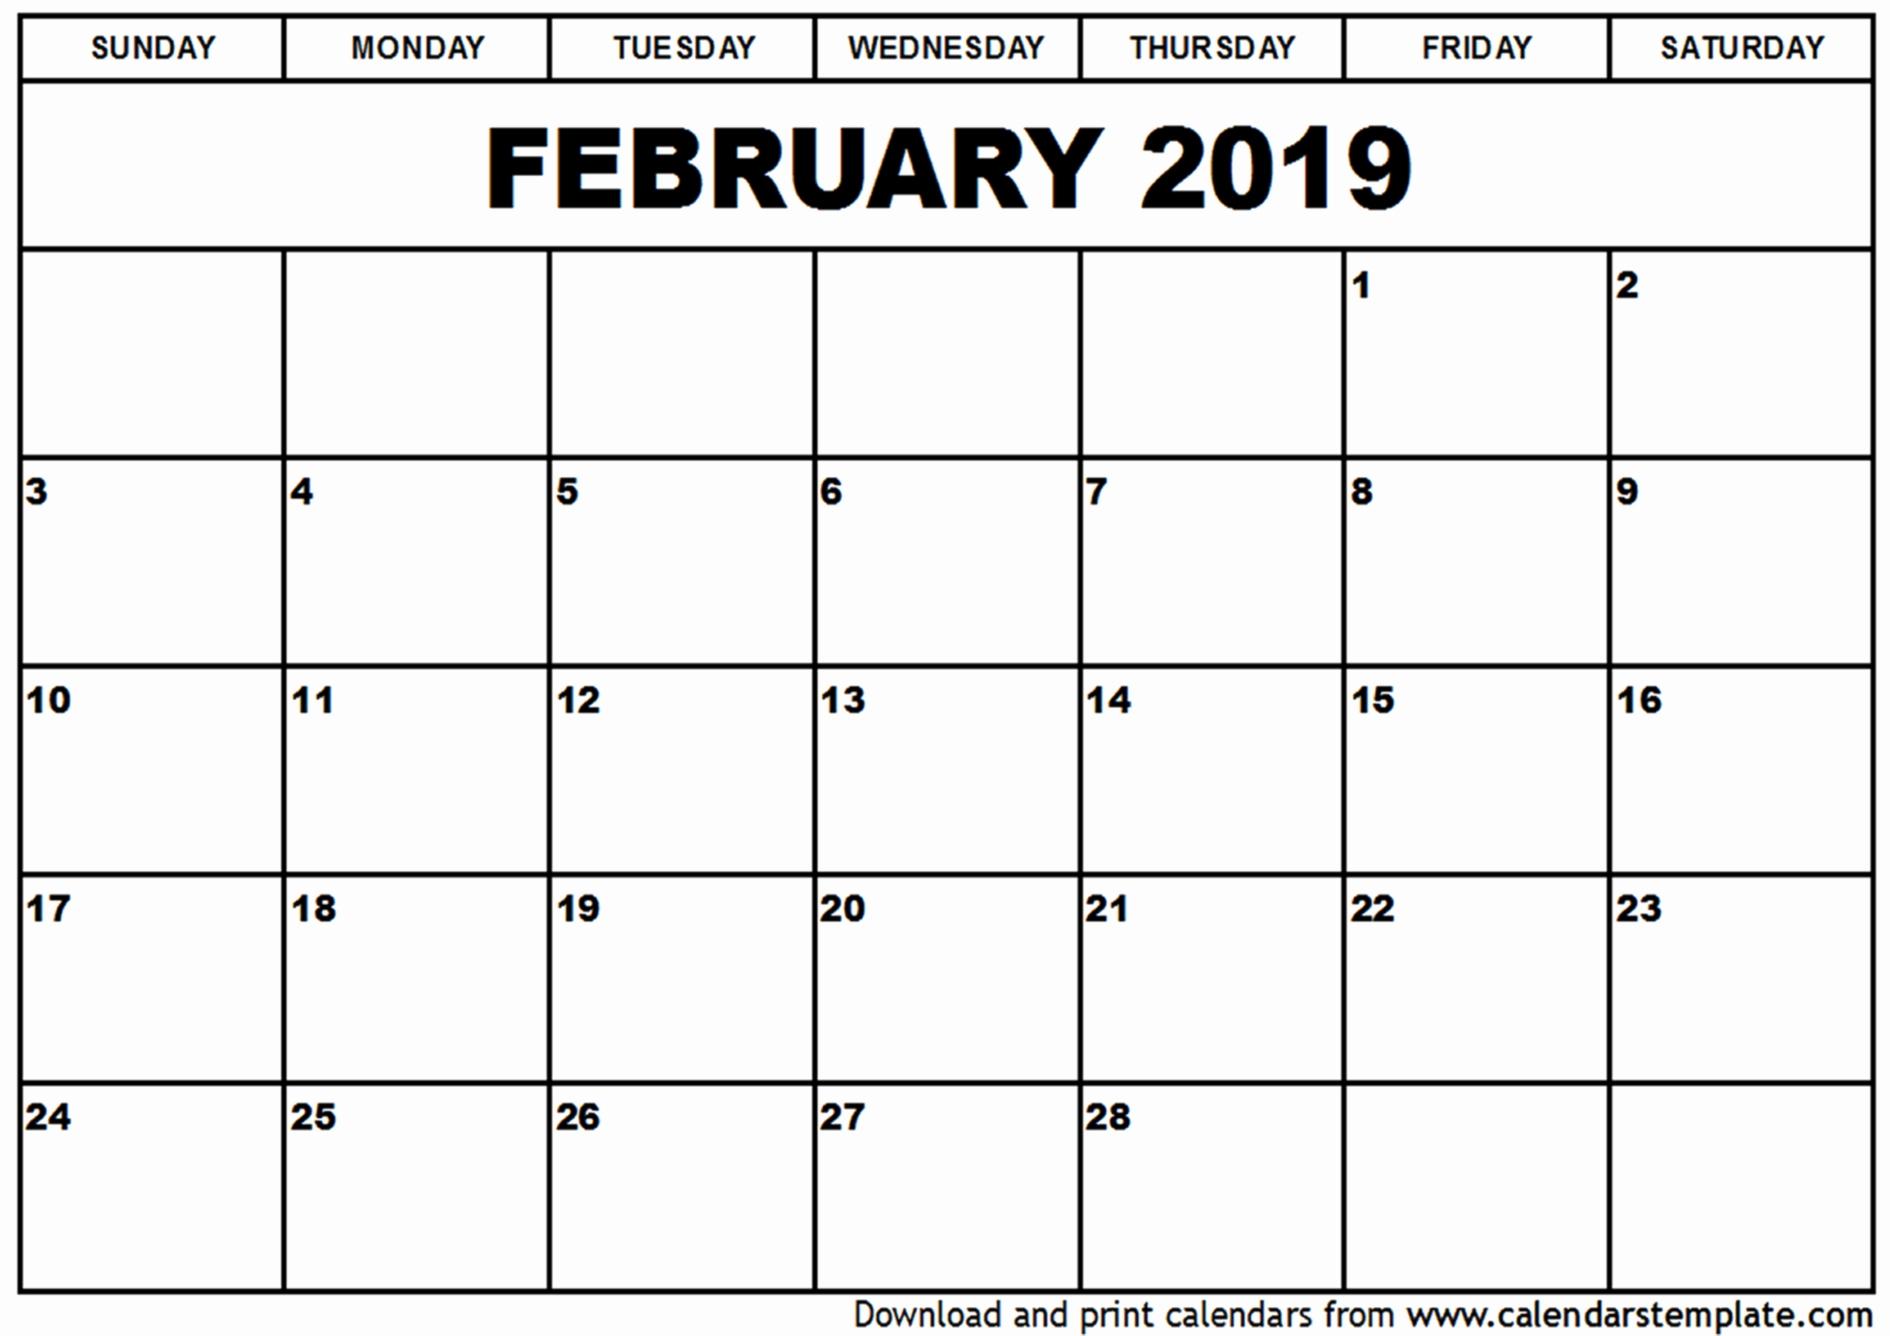 Printable Calendar February 2019 Australia Australia Calendar 2019